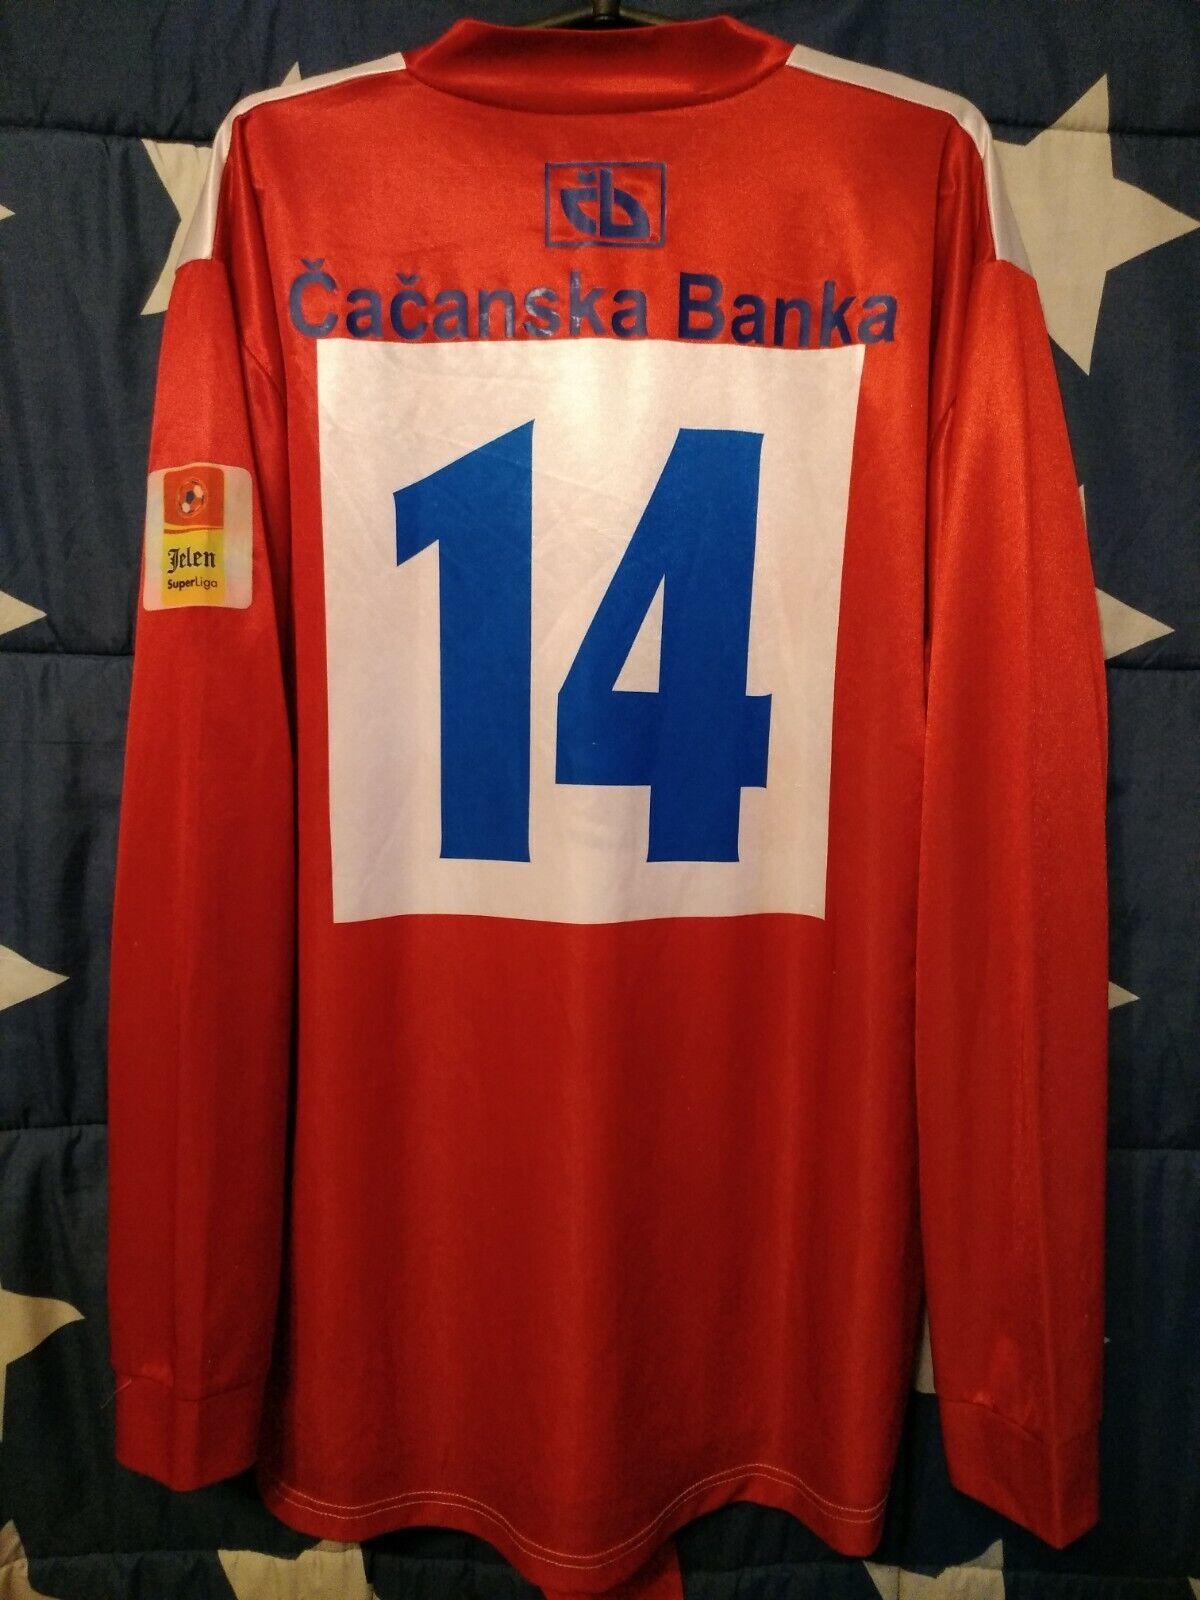 FK Borac Cacak (Serbia) Match Issue Home Football Long Sleeve Shirt Jersey